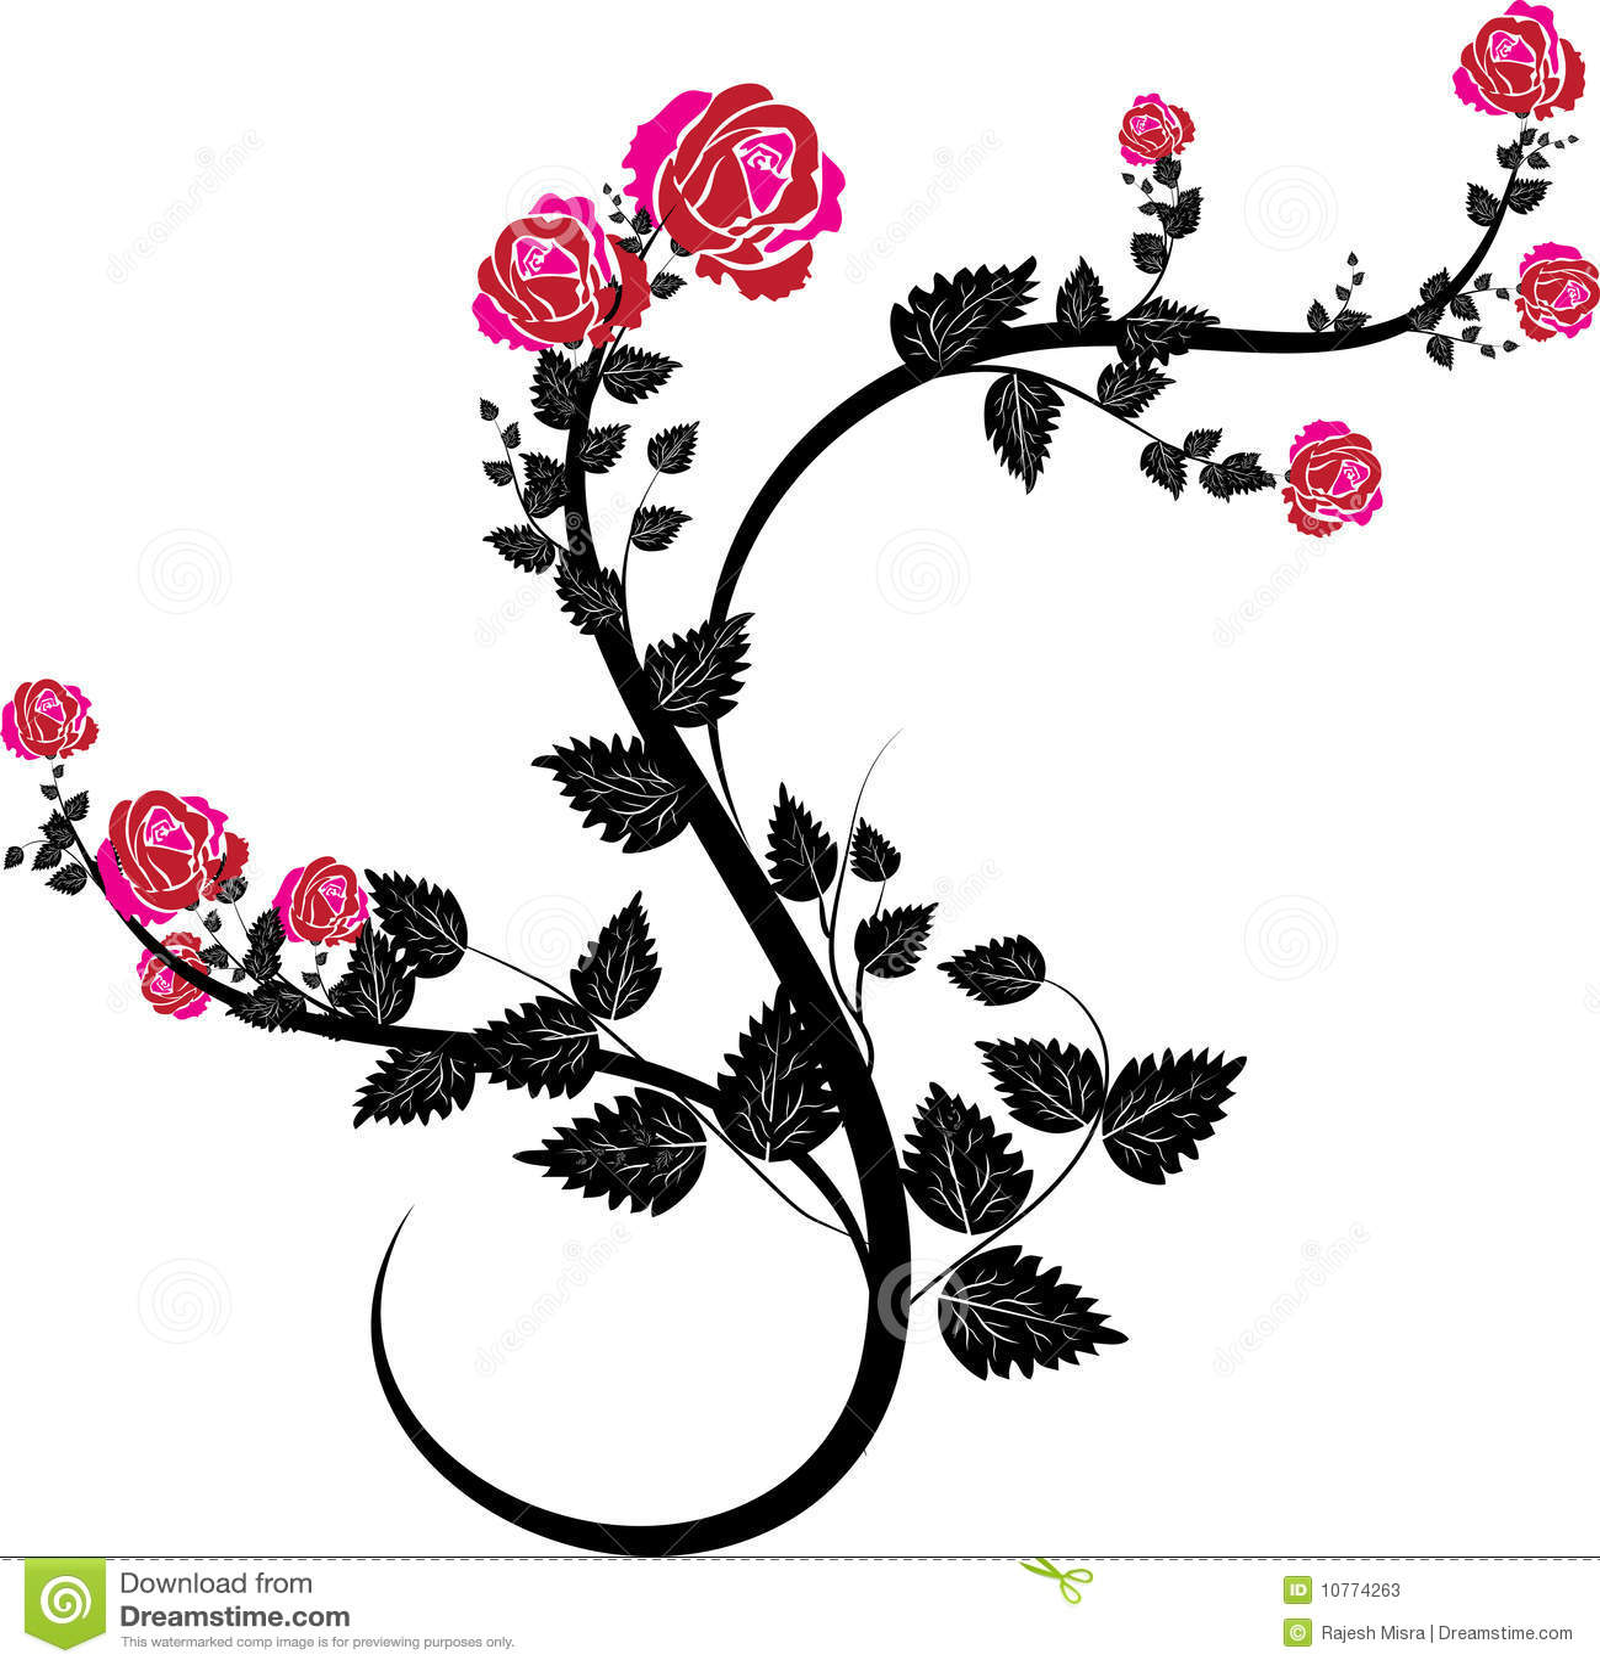 Rosa vines-9